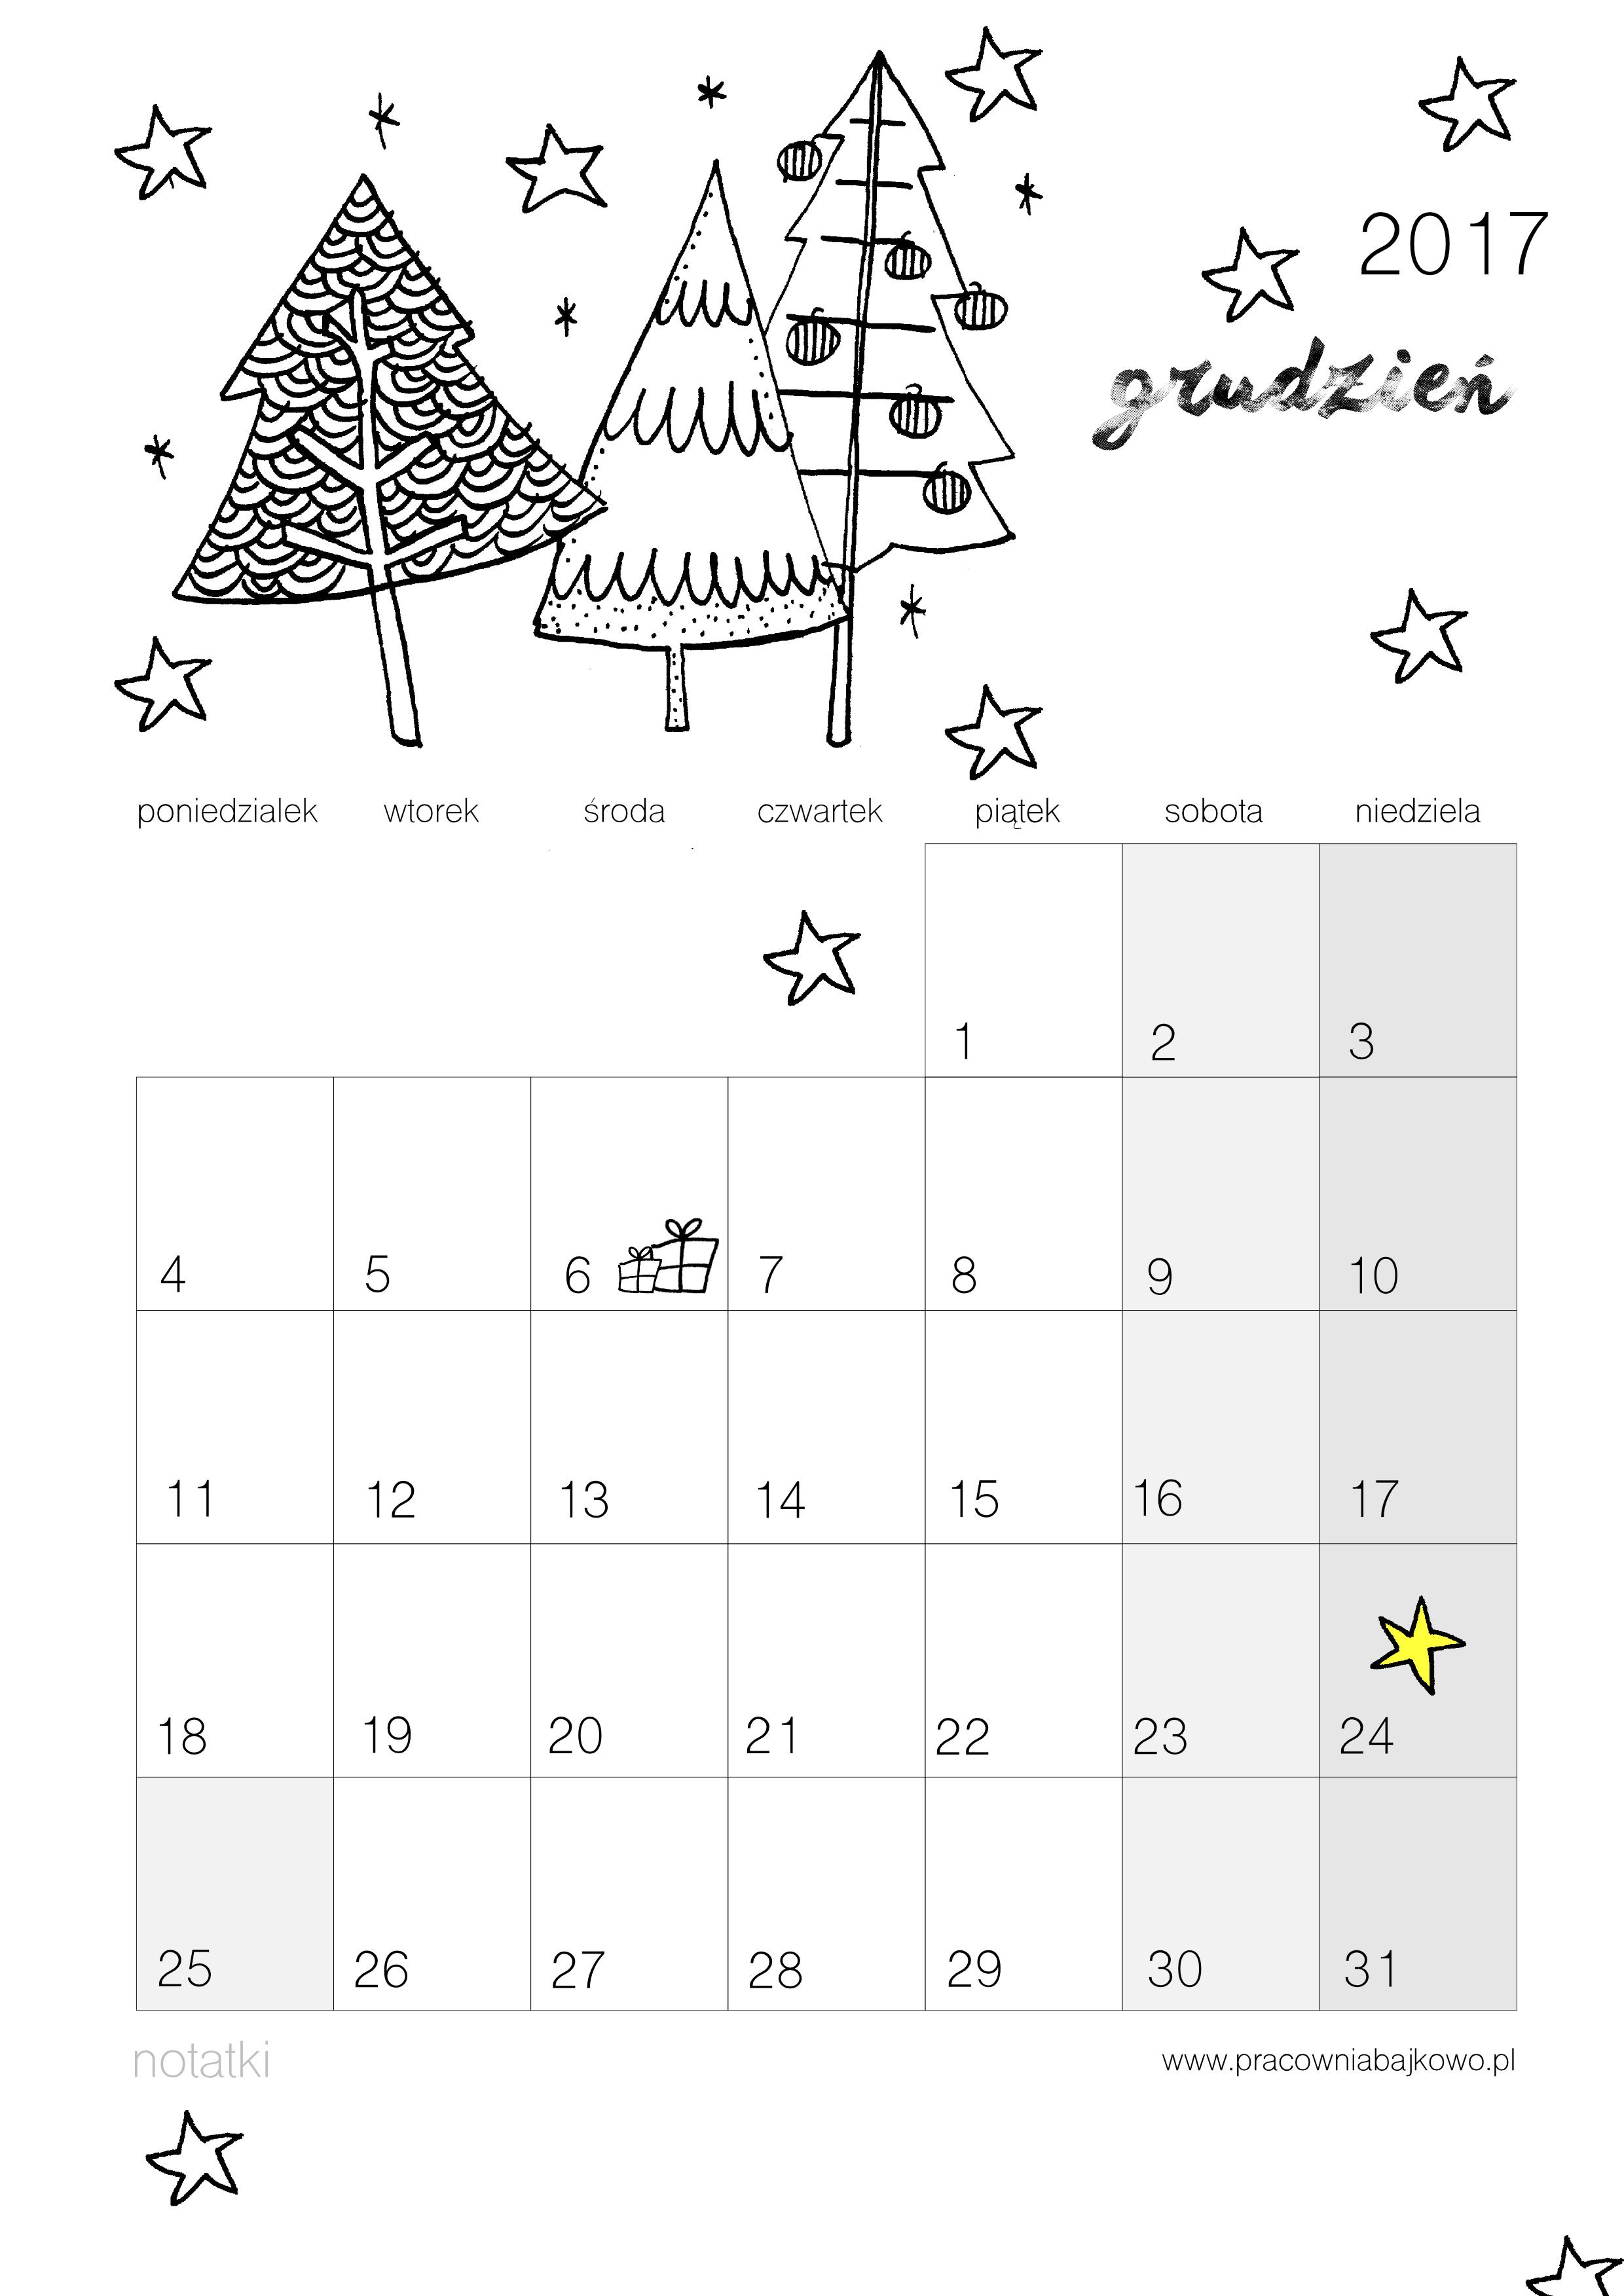 012 kalendarz 2017 grudzień